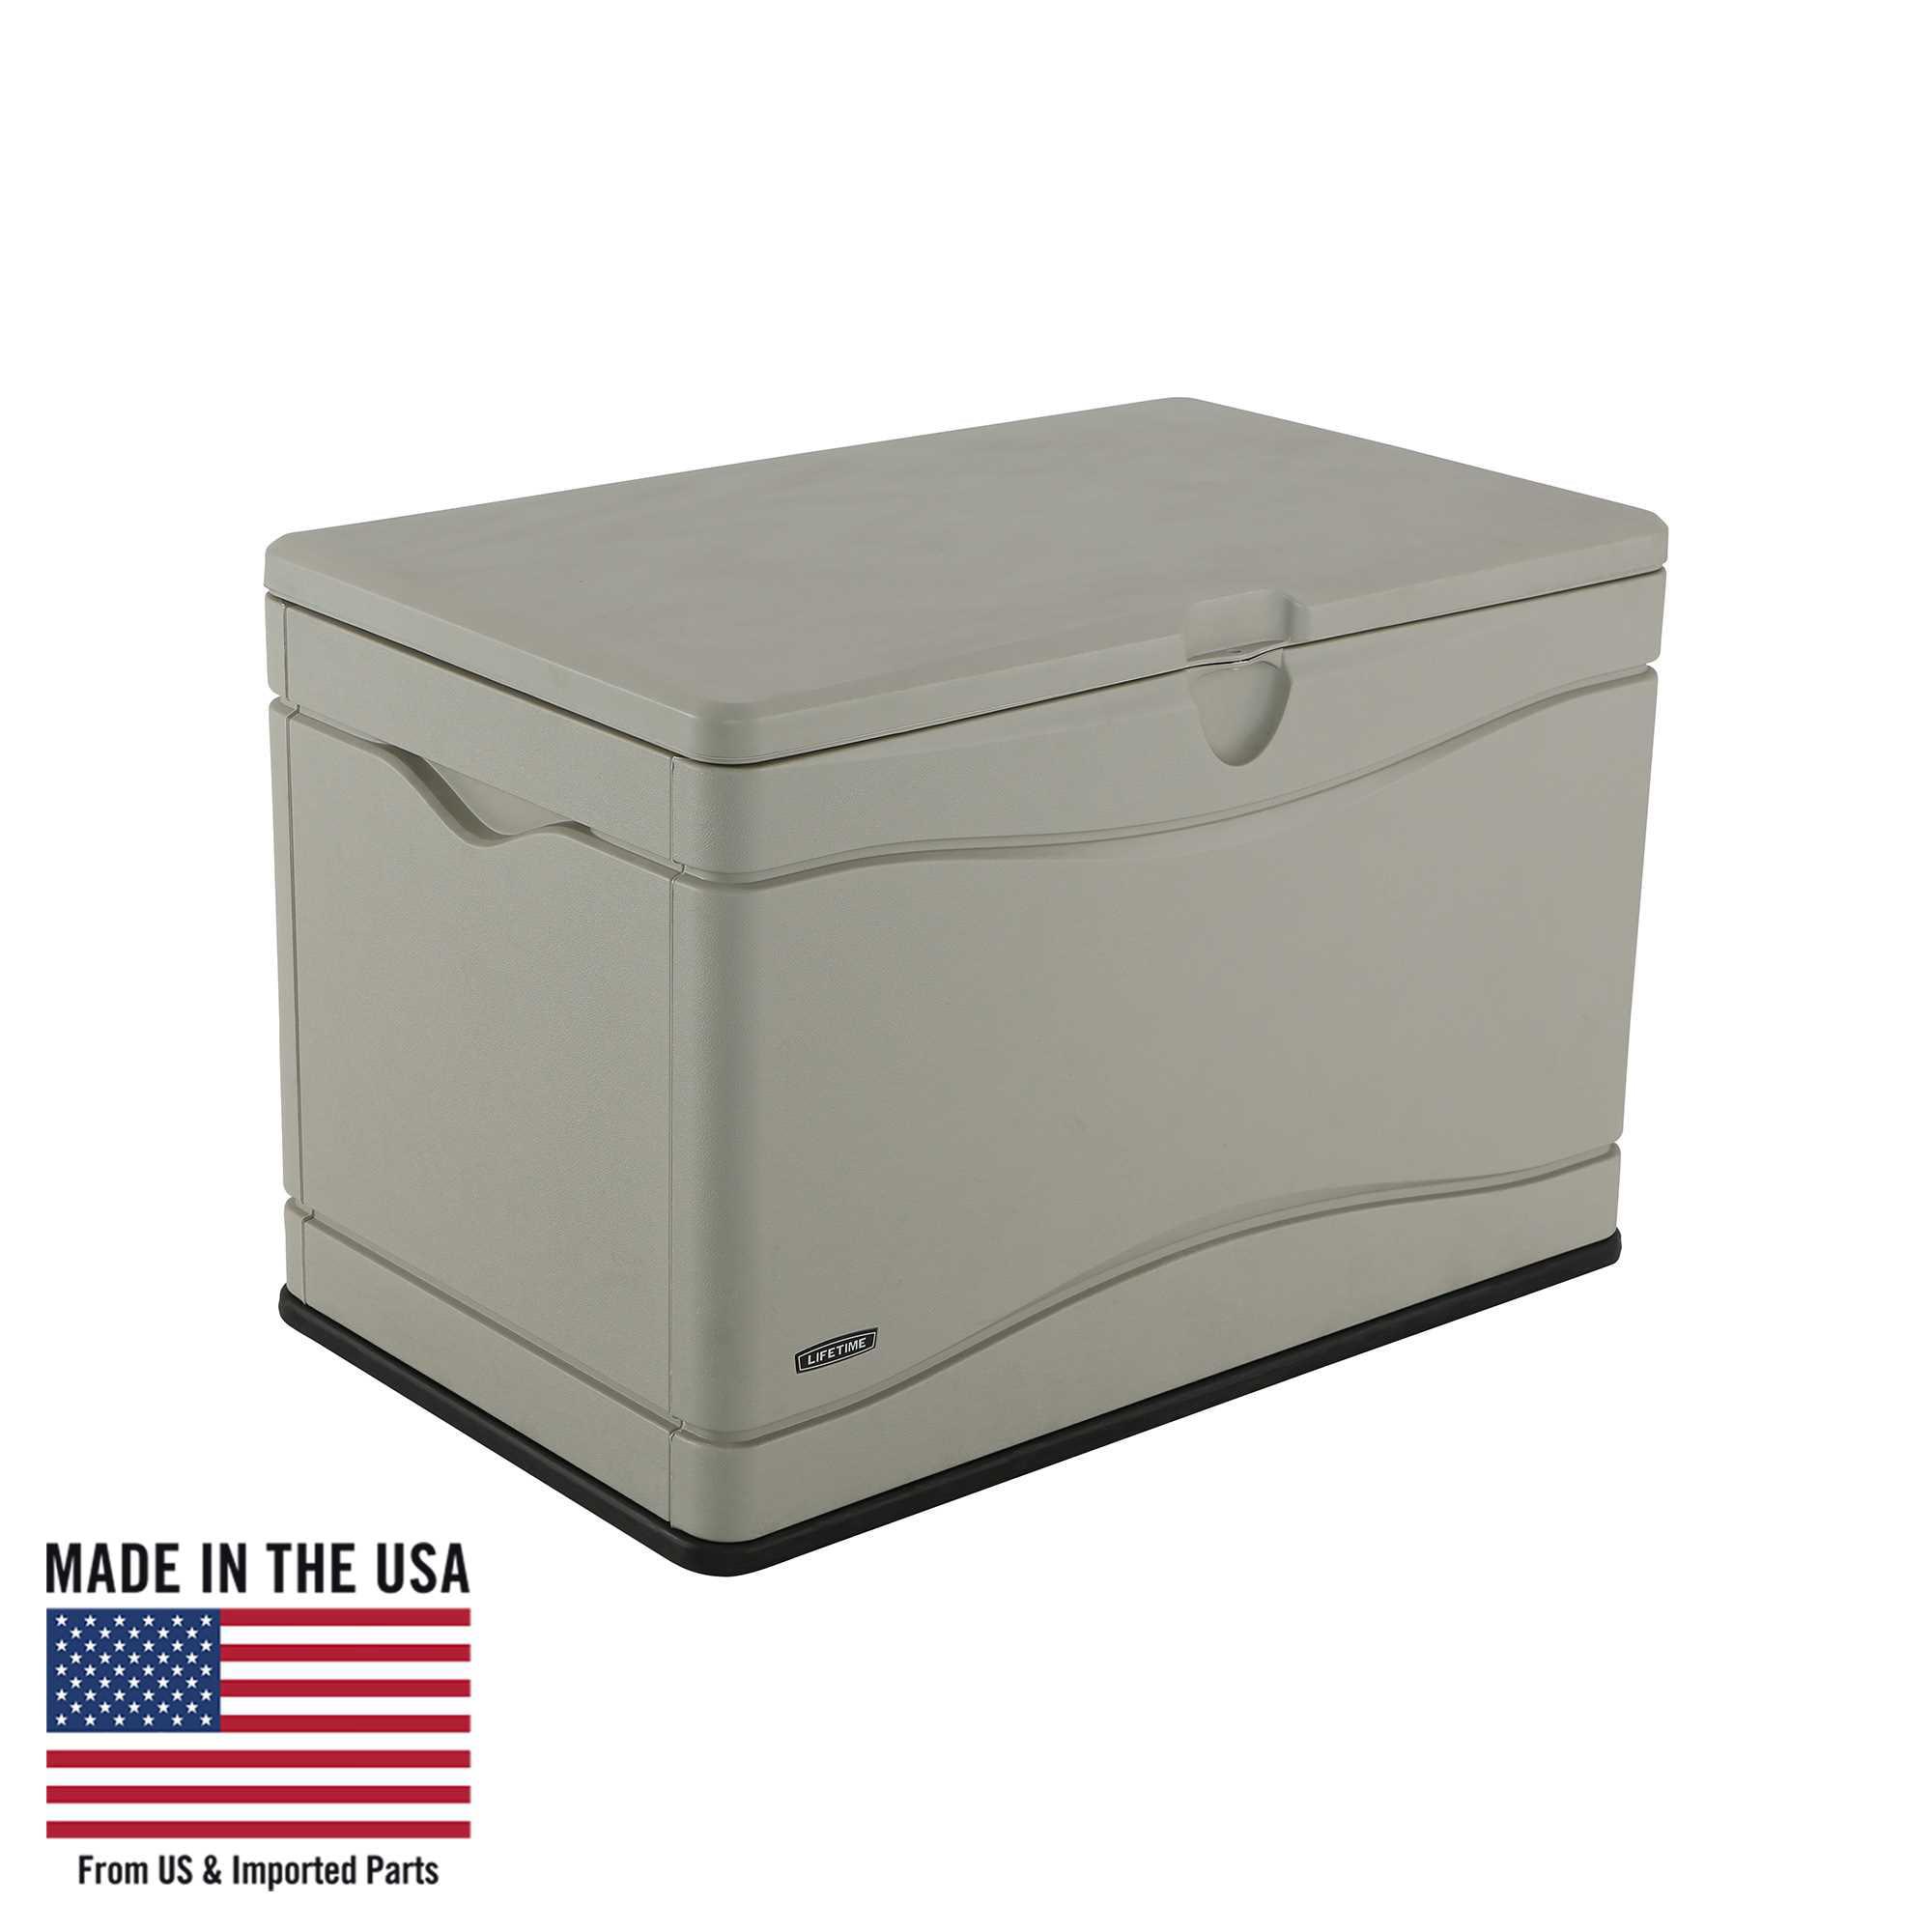 Lifetime Heavy-Duty Outdoor Storage Deck Box (80 Gallon), 60059